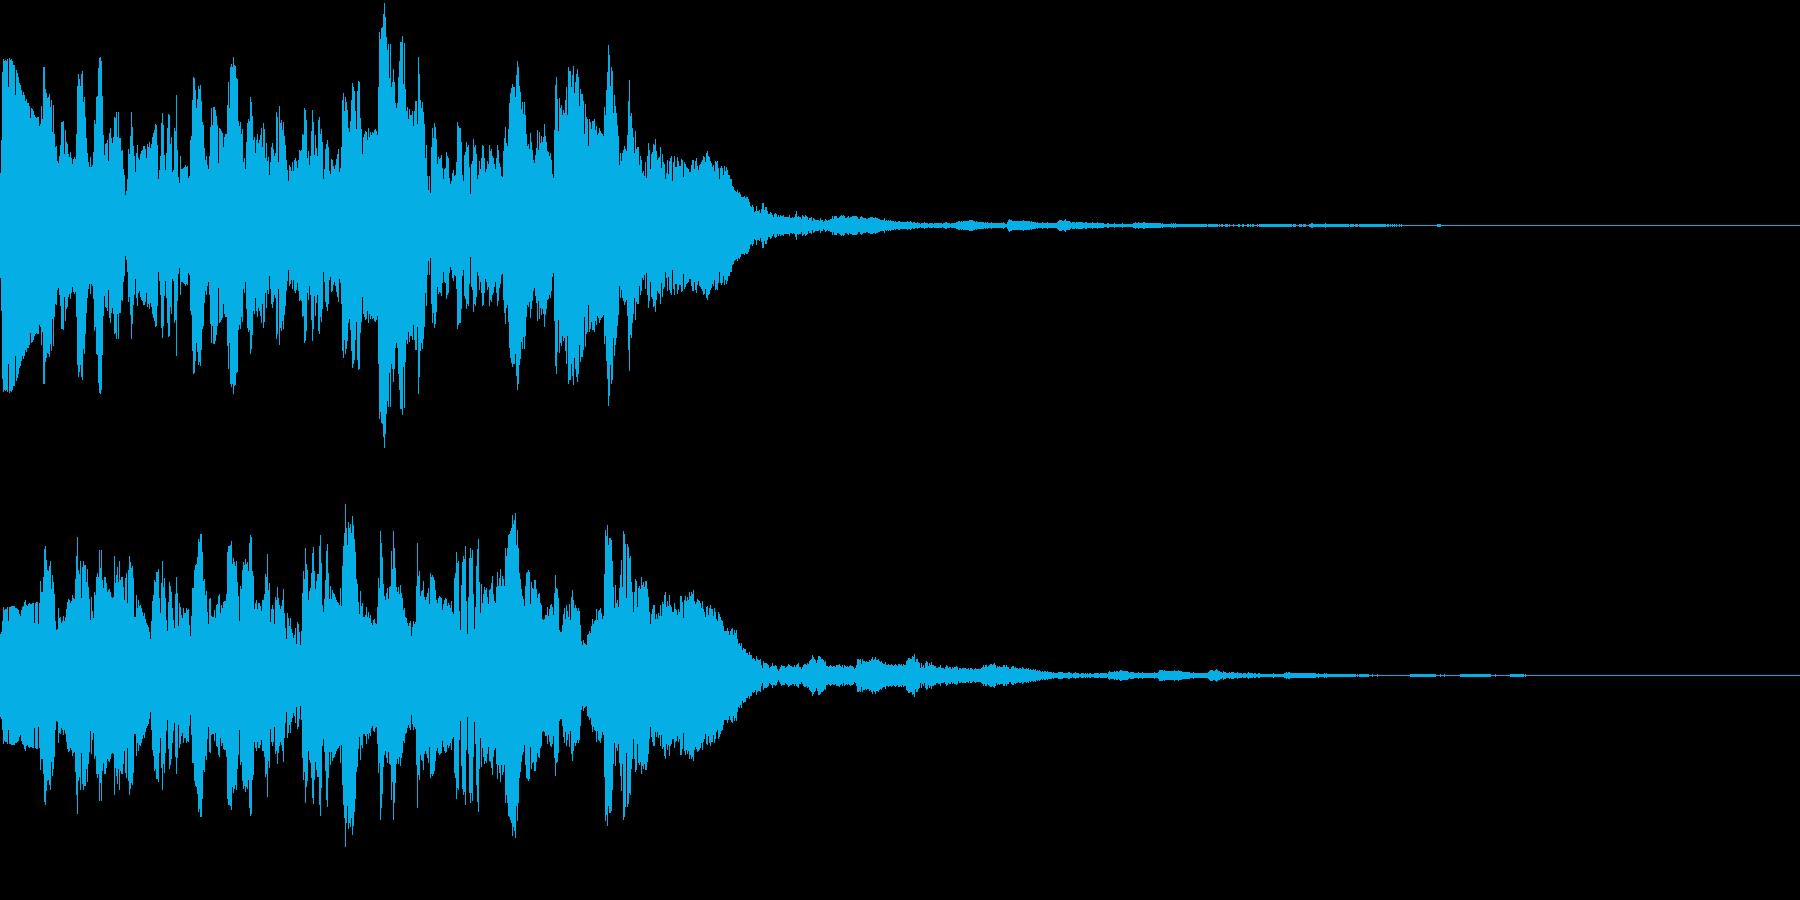 GameSFX 敵との遭遇音風SEの再生済みの波形